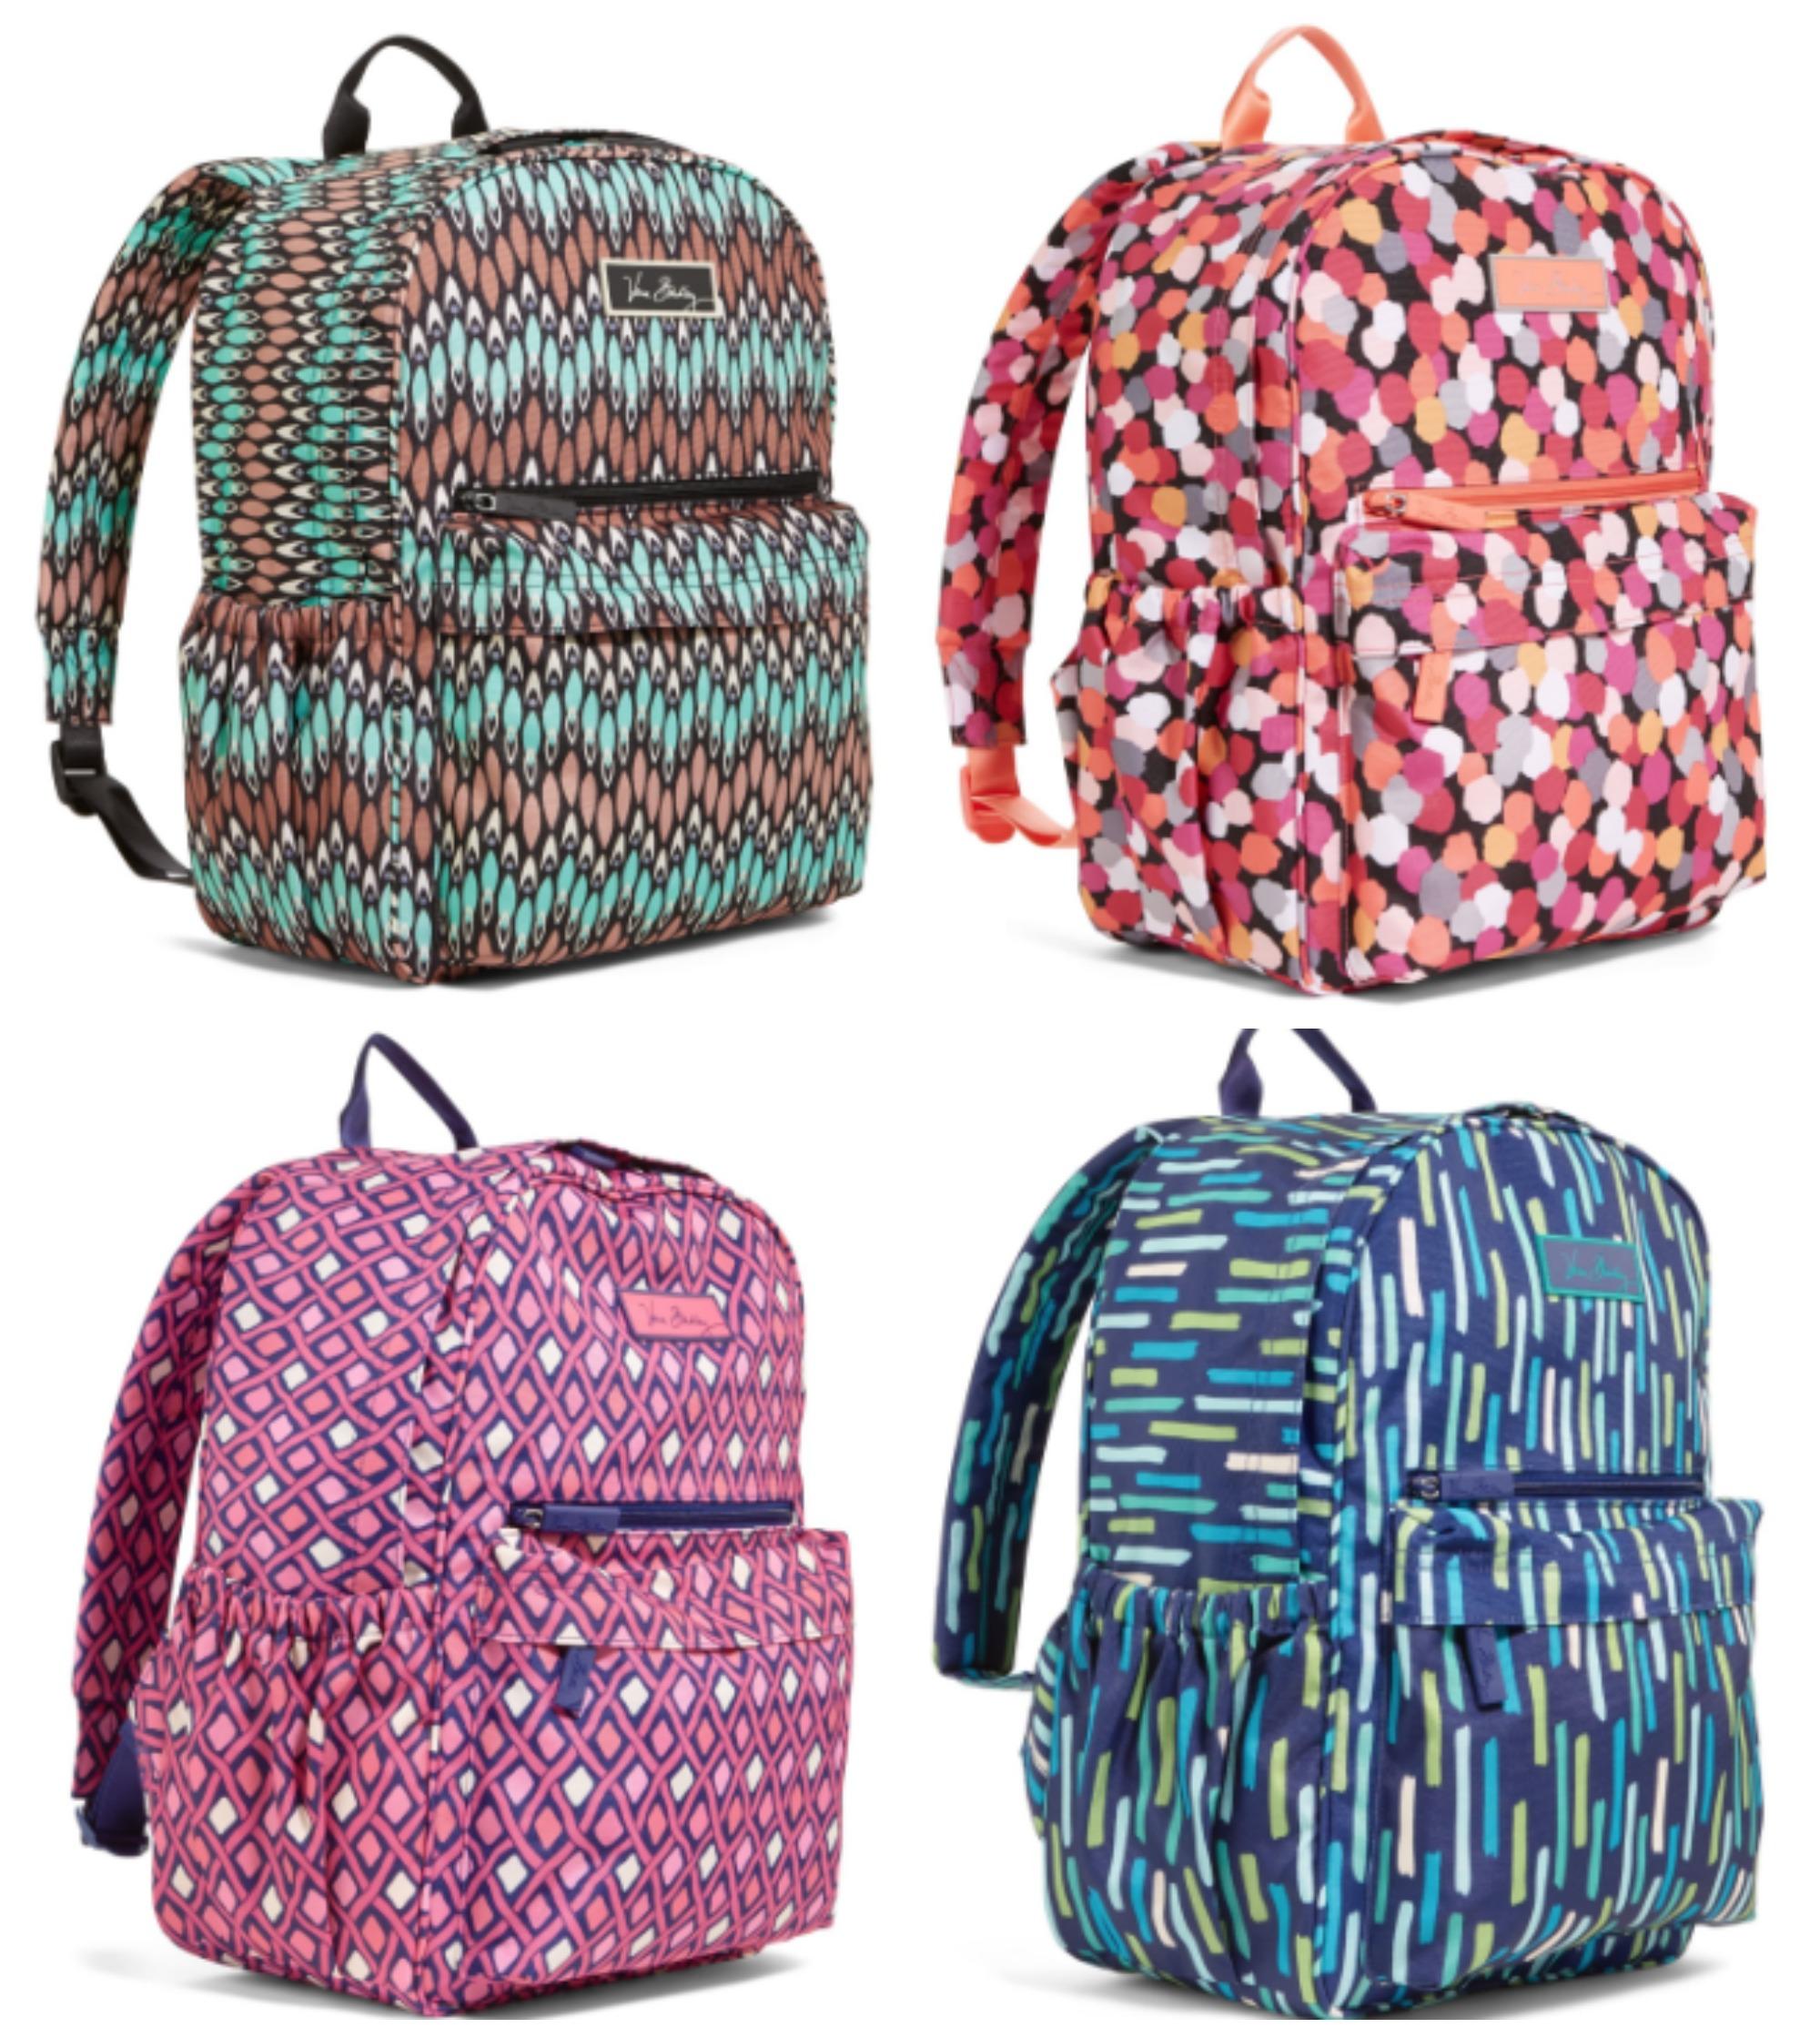 freebies2deals-bags